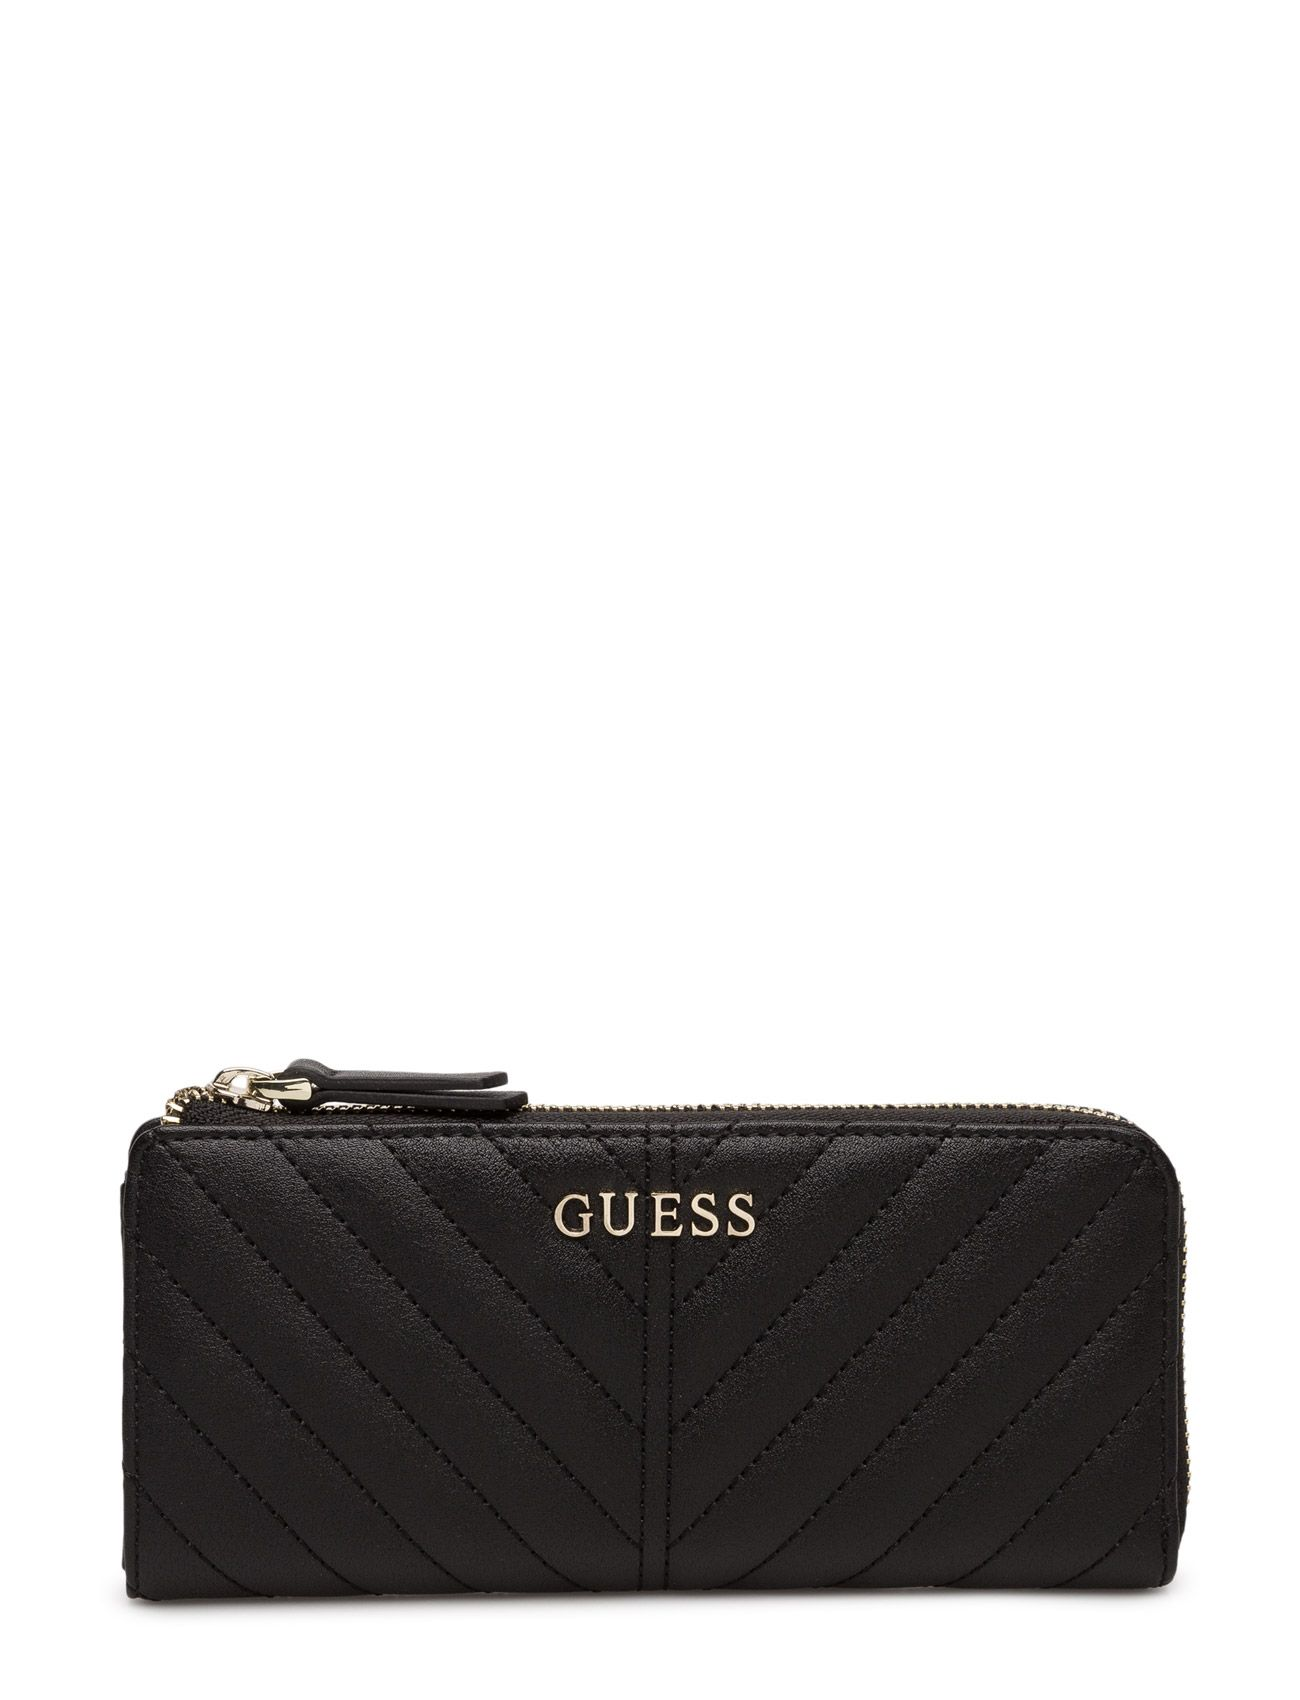 Addison Zip, kaunis lompakko.